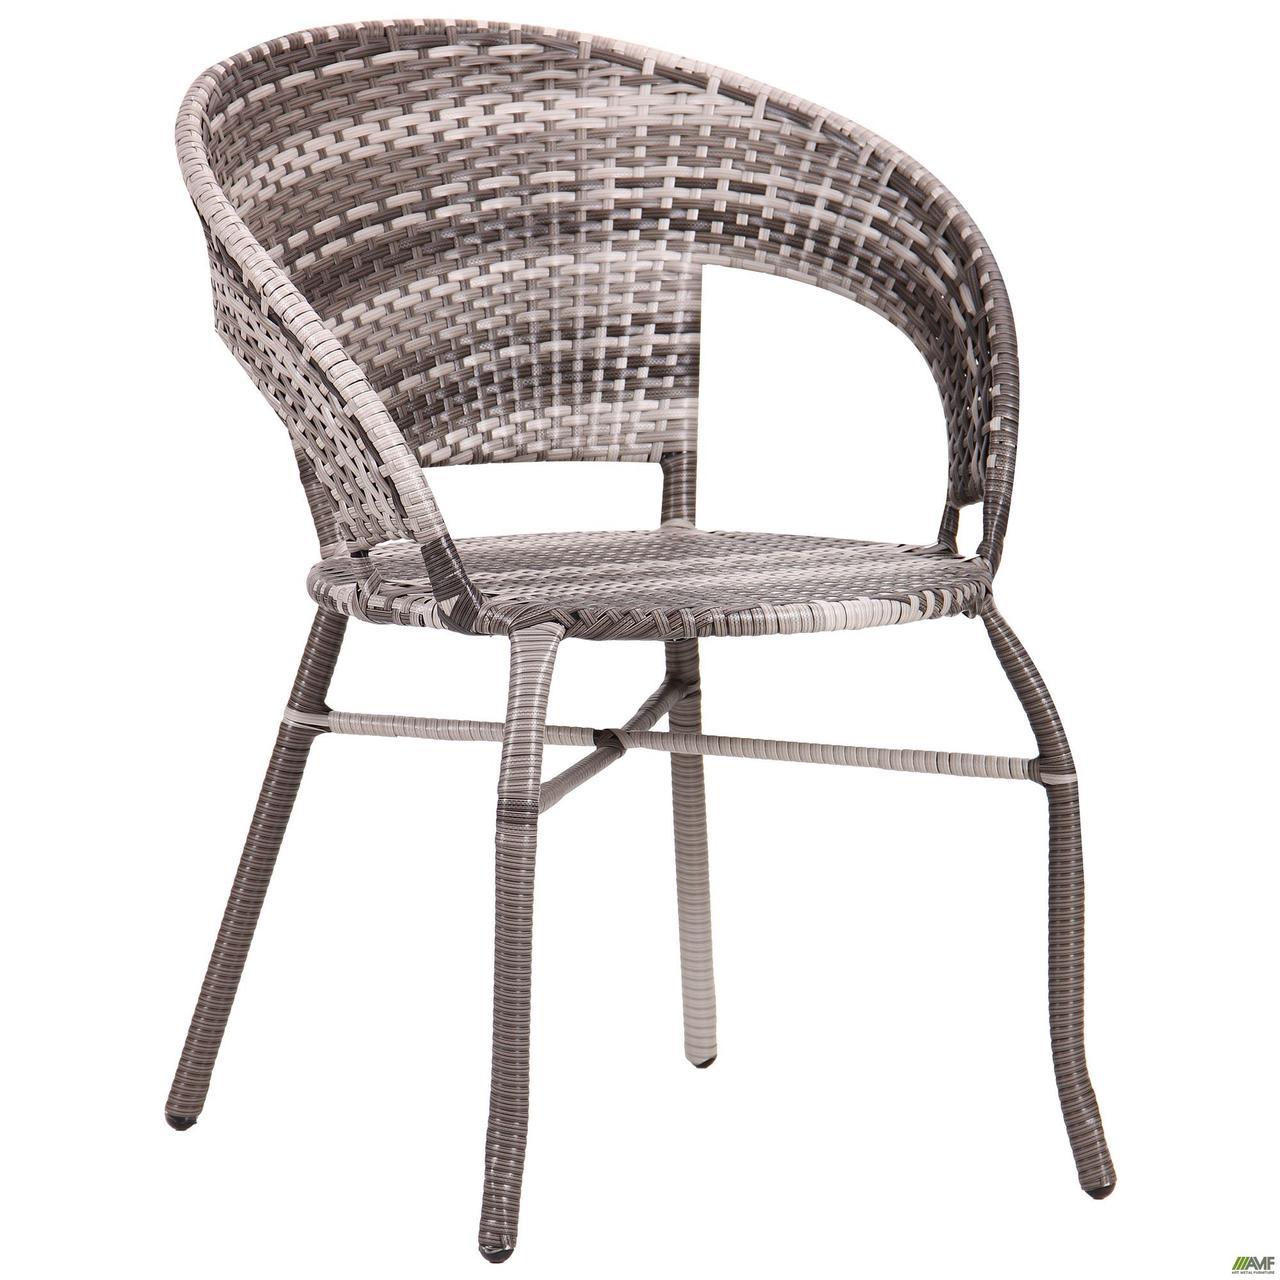 Садове крісло AMF Catalina ротанг сірий для кафе на терасу